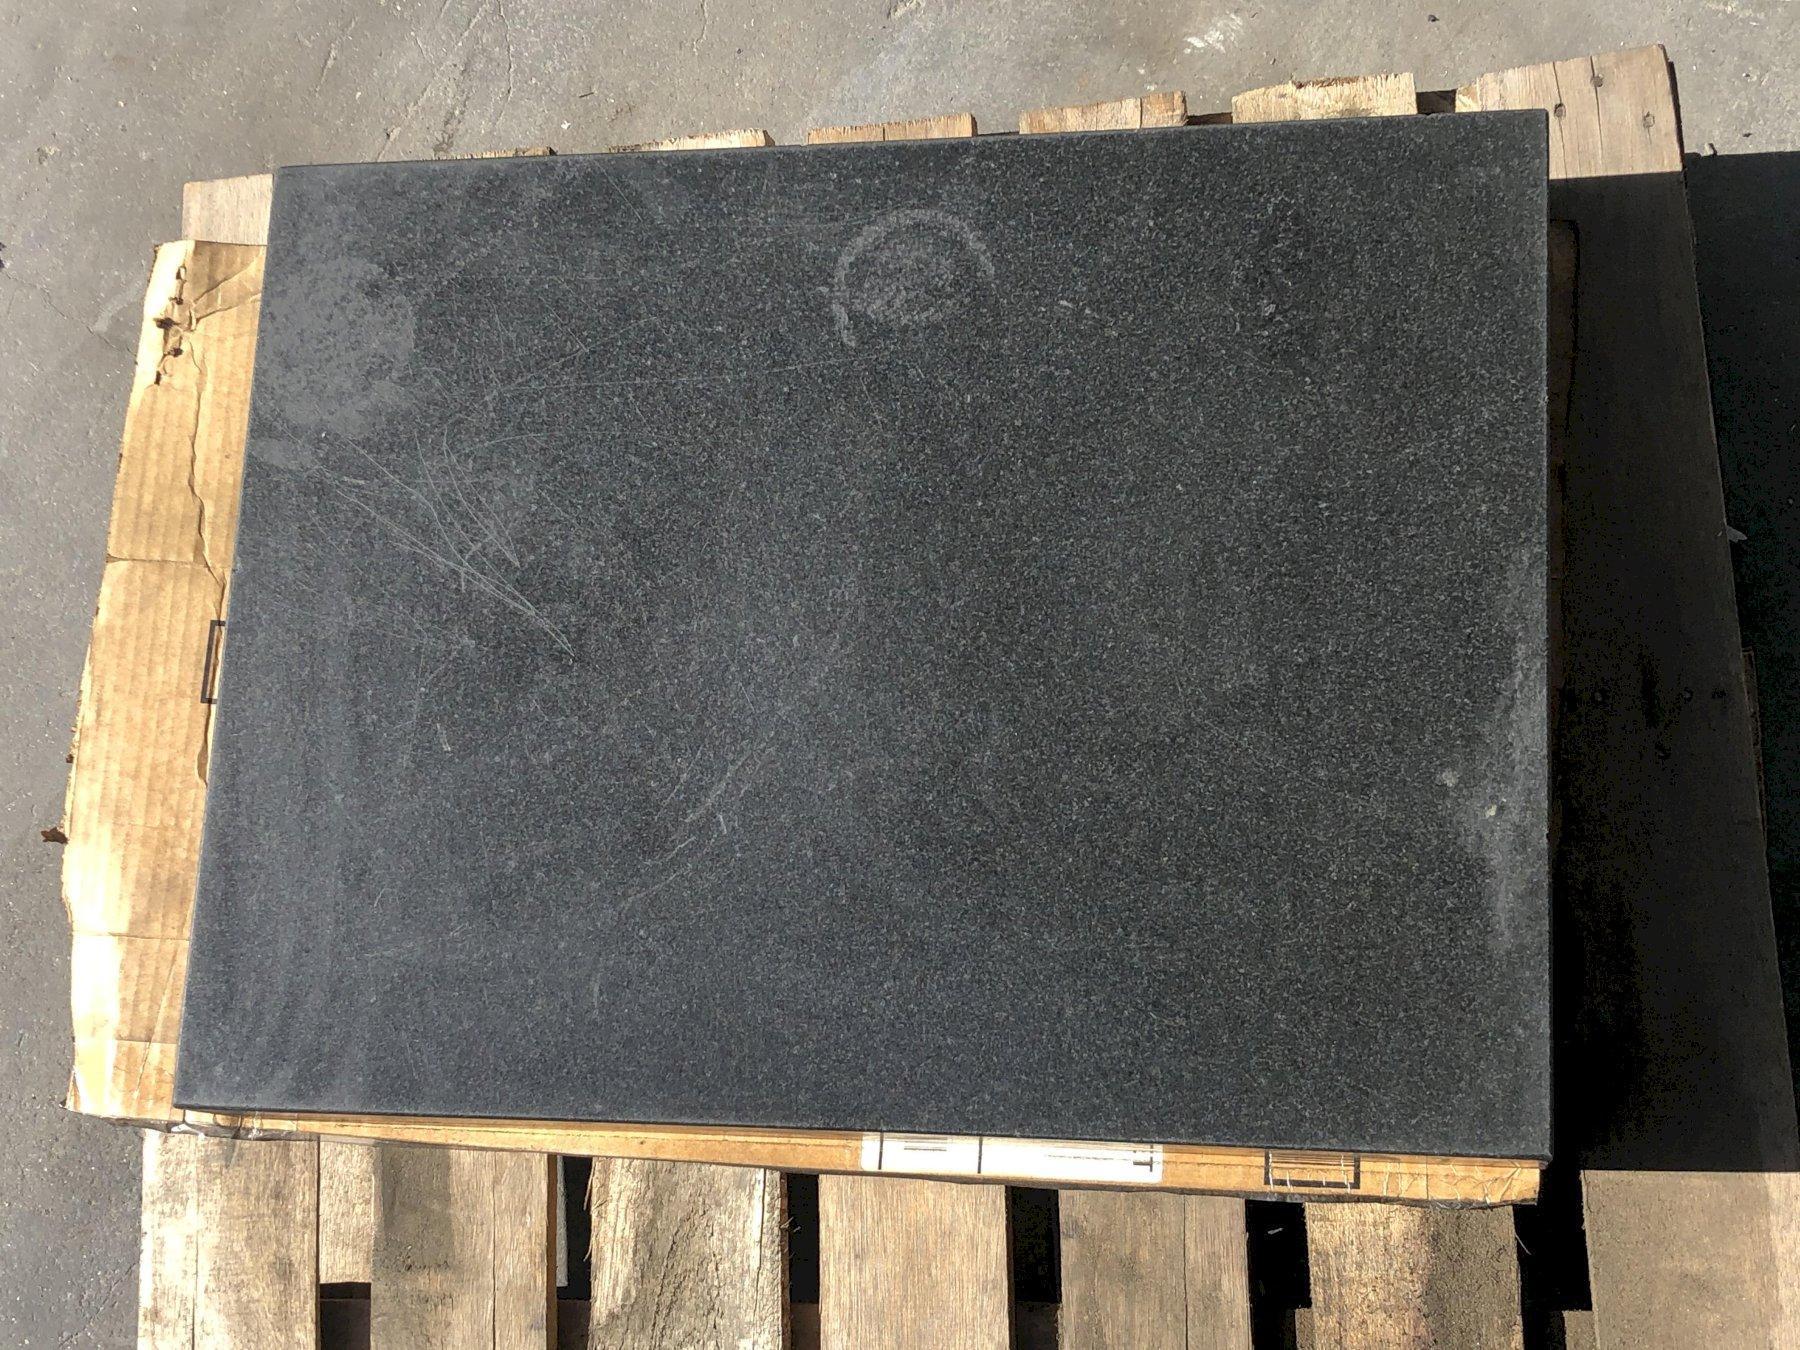 "Granite Surface Plate 24-1/8"" x 18-1/4"" x 3-1/4"""